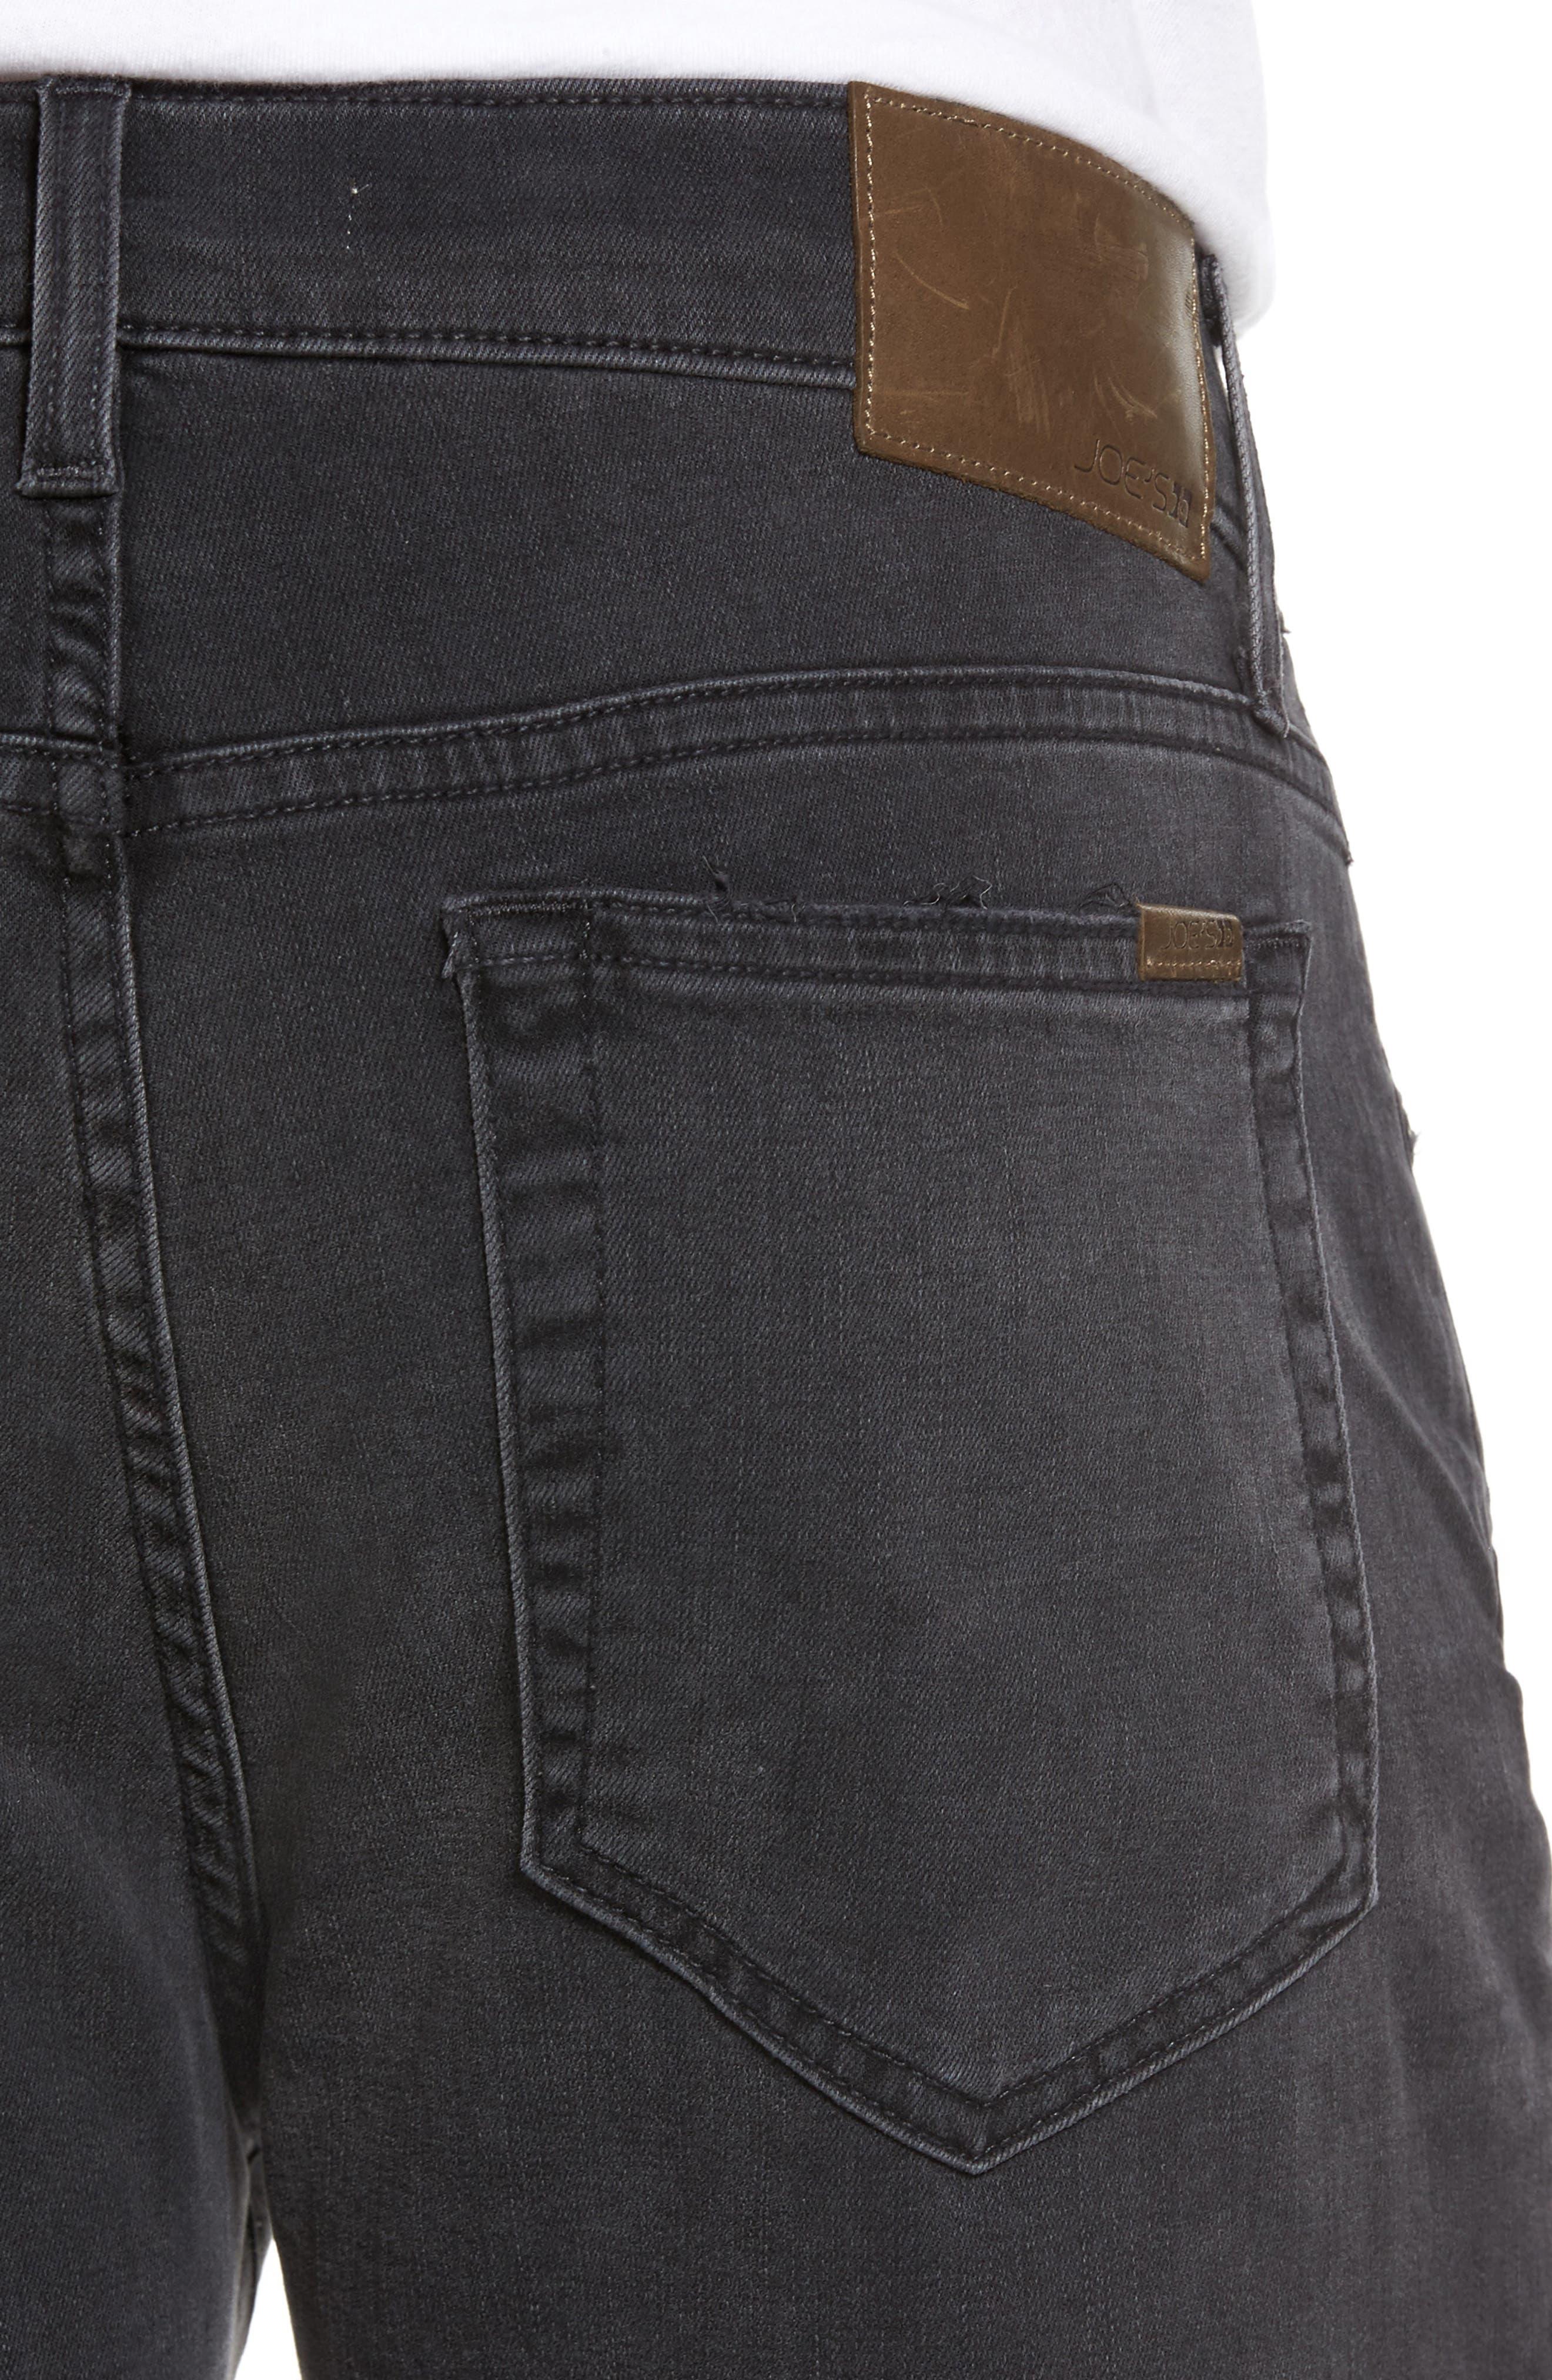 Brixton Slim Straight Fit Jeans,                             Alternate thumbnail 4, color,                             015